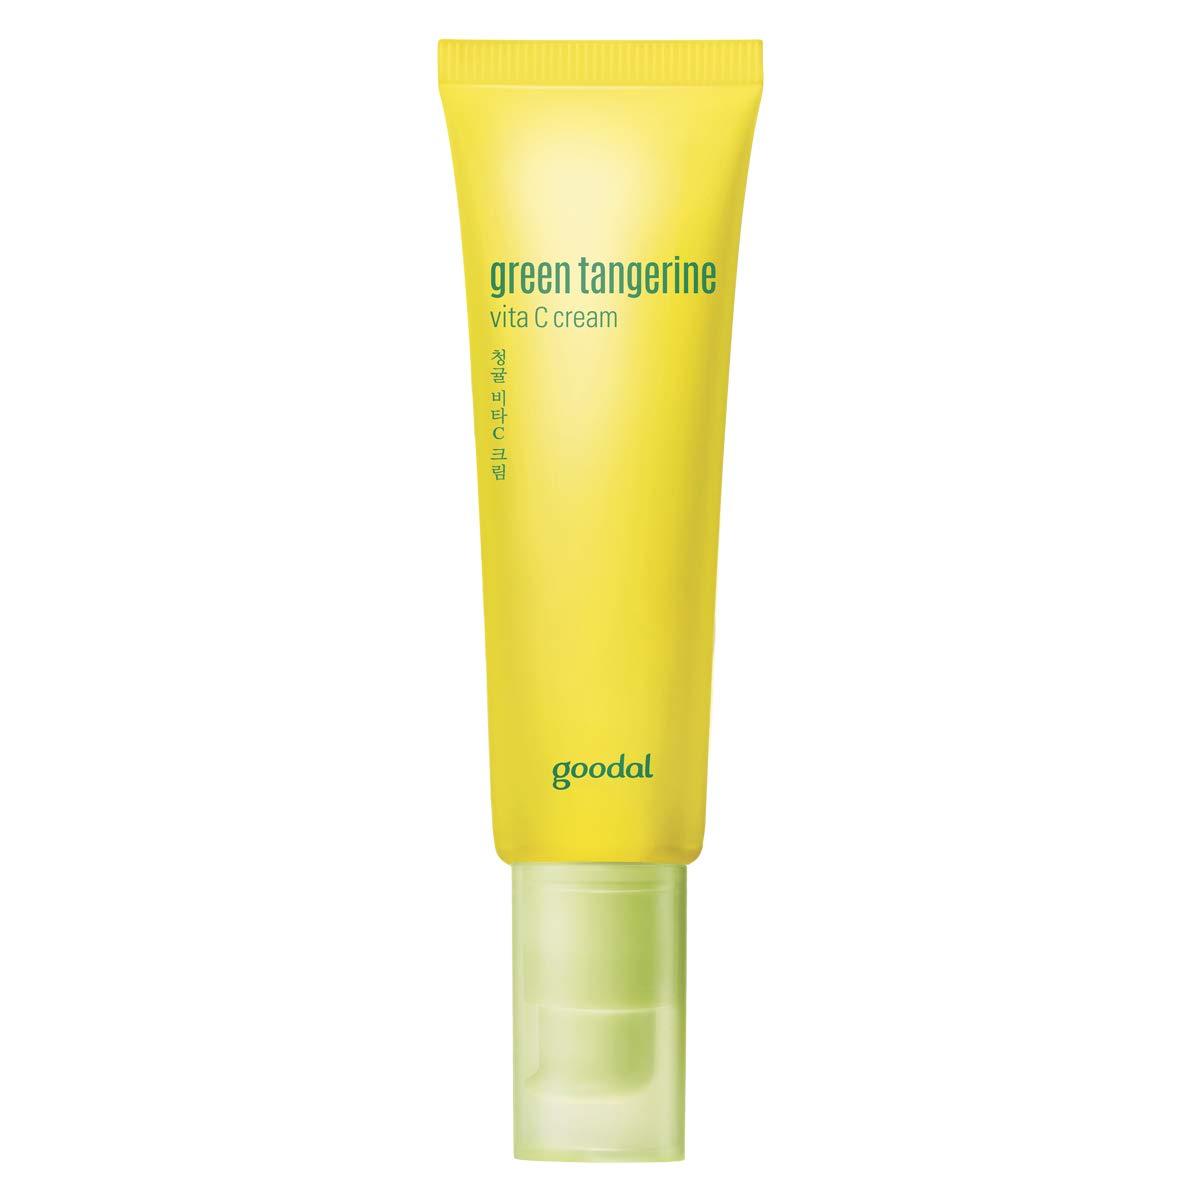 Goodal Green Tangerine Vitamin C Cream for Oily or Combination Skin | Brightening, Dark Spot Treatment, Anti-Aging Skin Repair, Acne Scars, Fine Lines, Hyperpigmentation, and Dark Circles (1.69 fl oz)